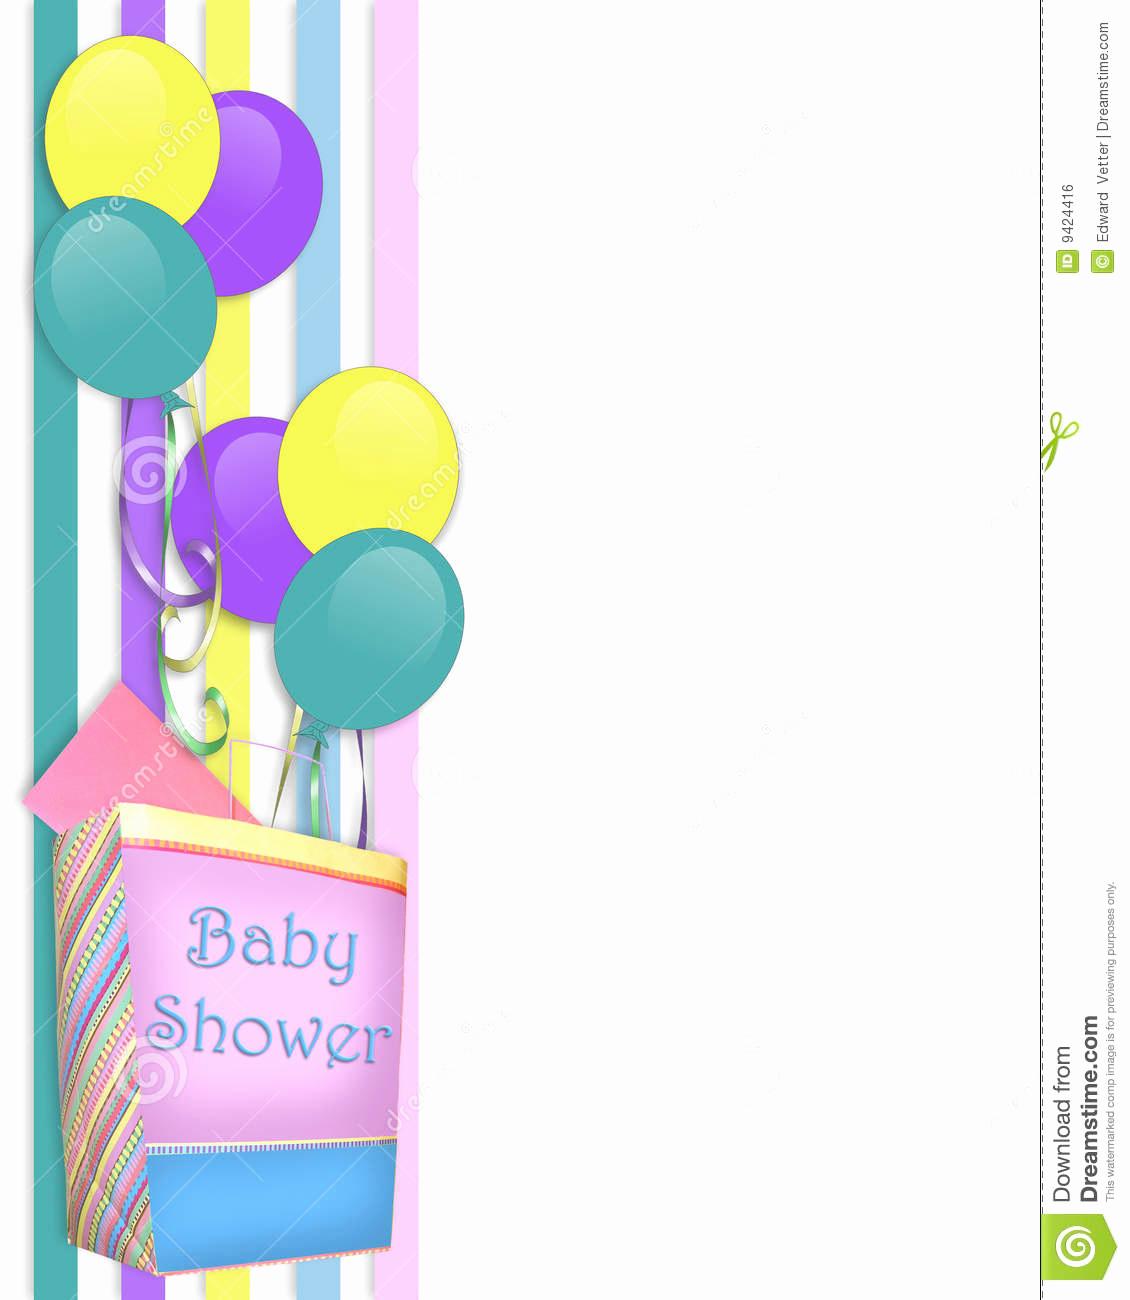 Baby Shower Invitation Borders Luxury Invitation Borders Clipart